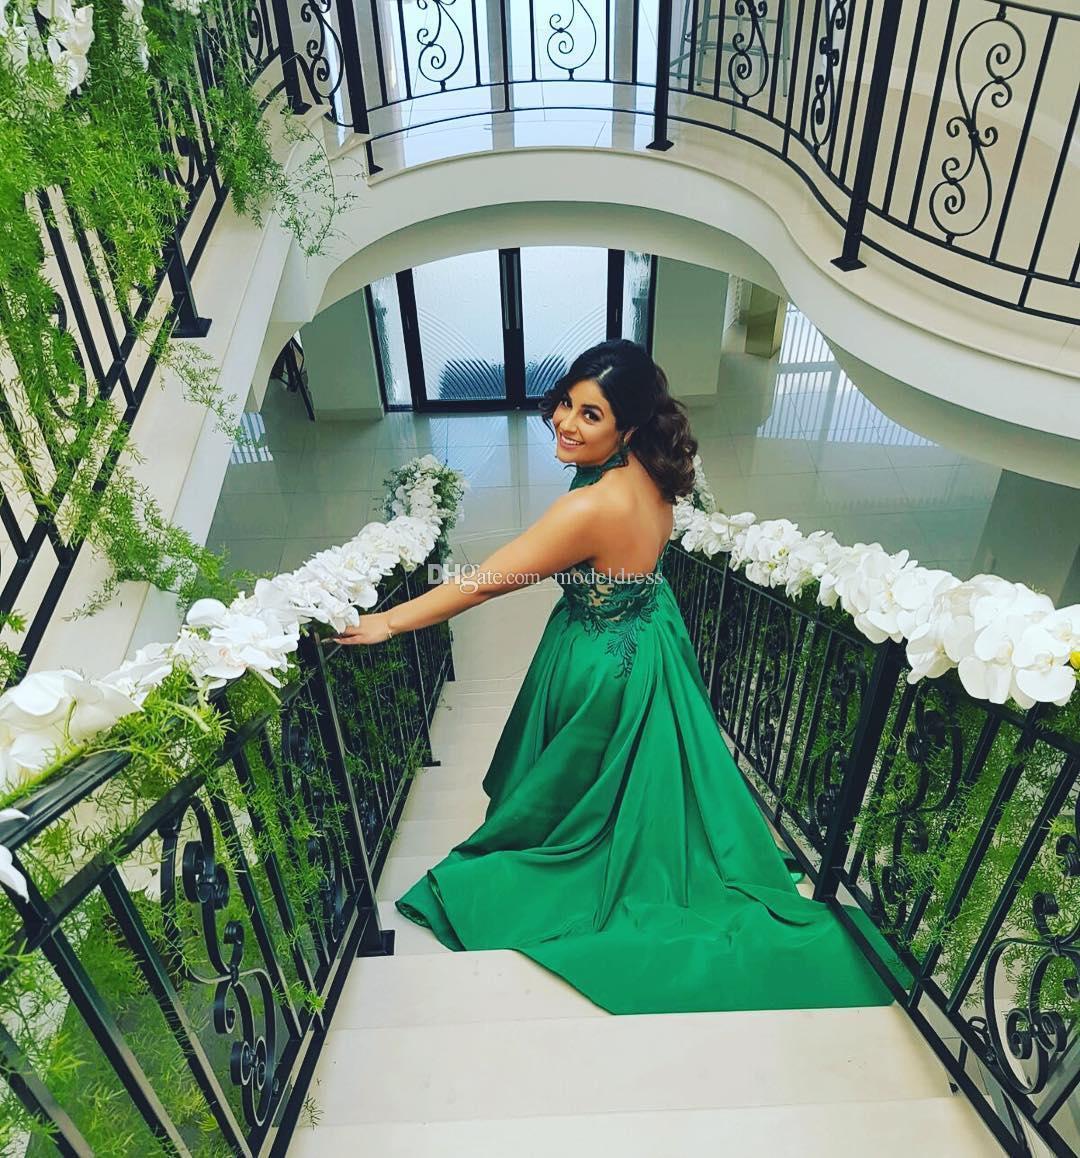 2018 New Backless Verde Vestidos de Baile Halter Apliques de Alta Baixa Sexy Cetim Árabe À Noite Partido Pageant Vestidos Vestidos De Fiesta Personalizado